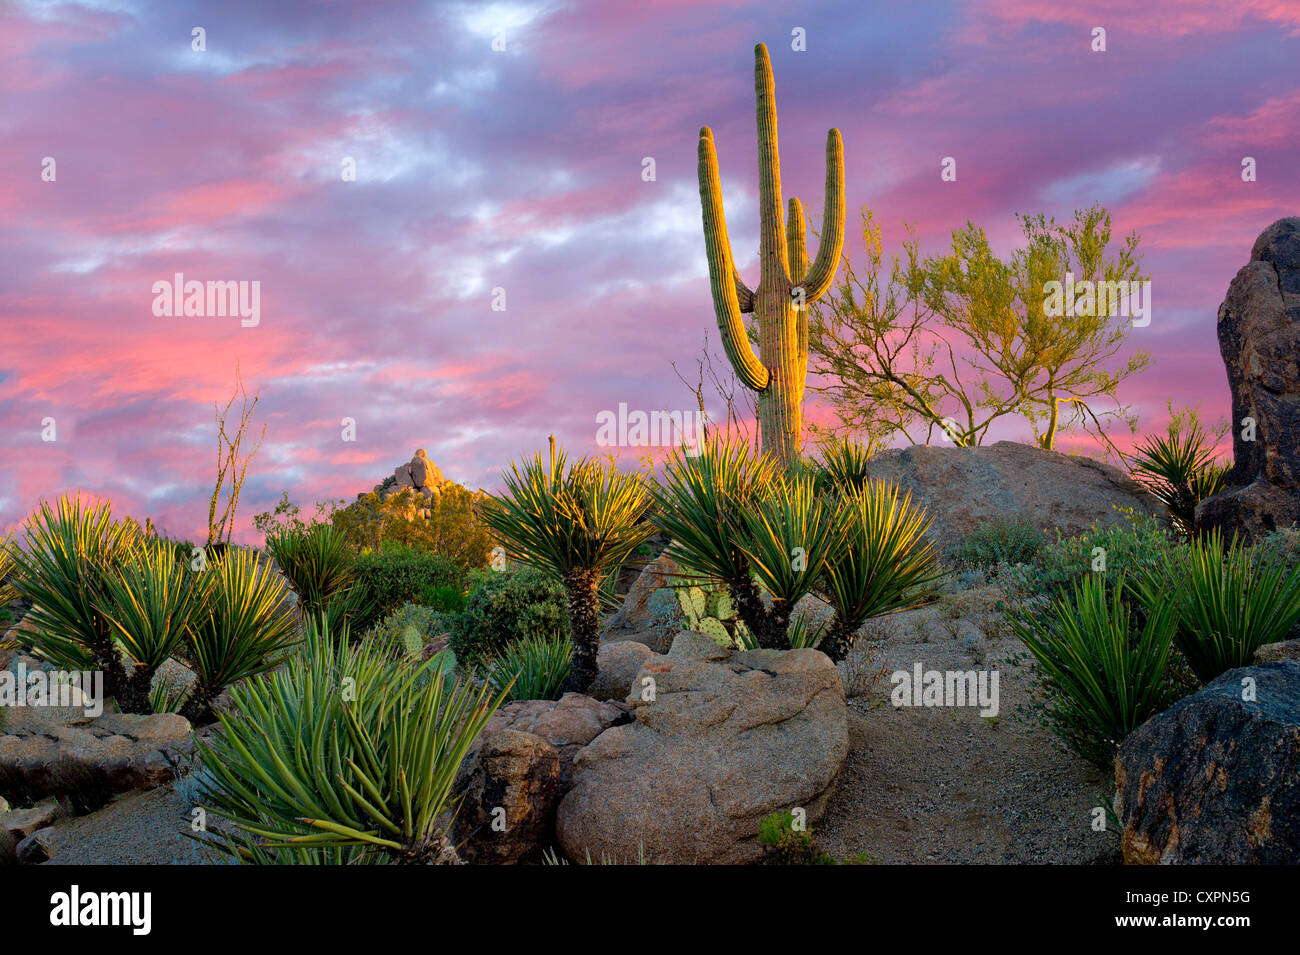 Cactus garden with saguaro cactus at sunrise. Sonoran Desert, Arizona - Stock Image